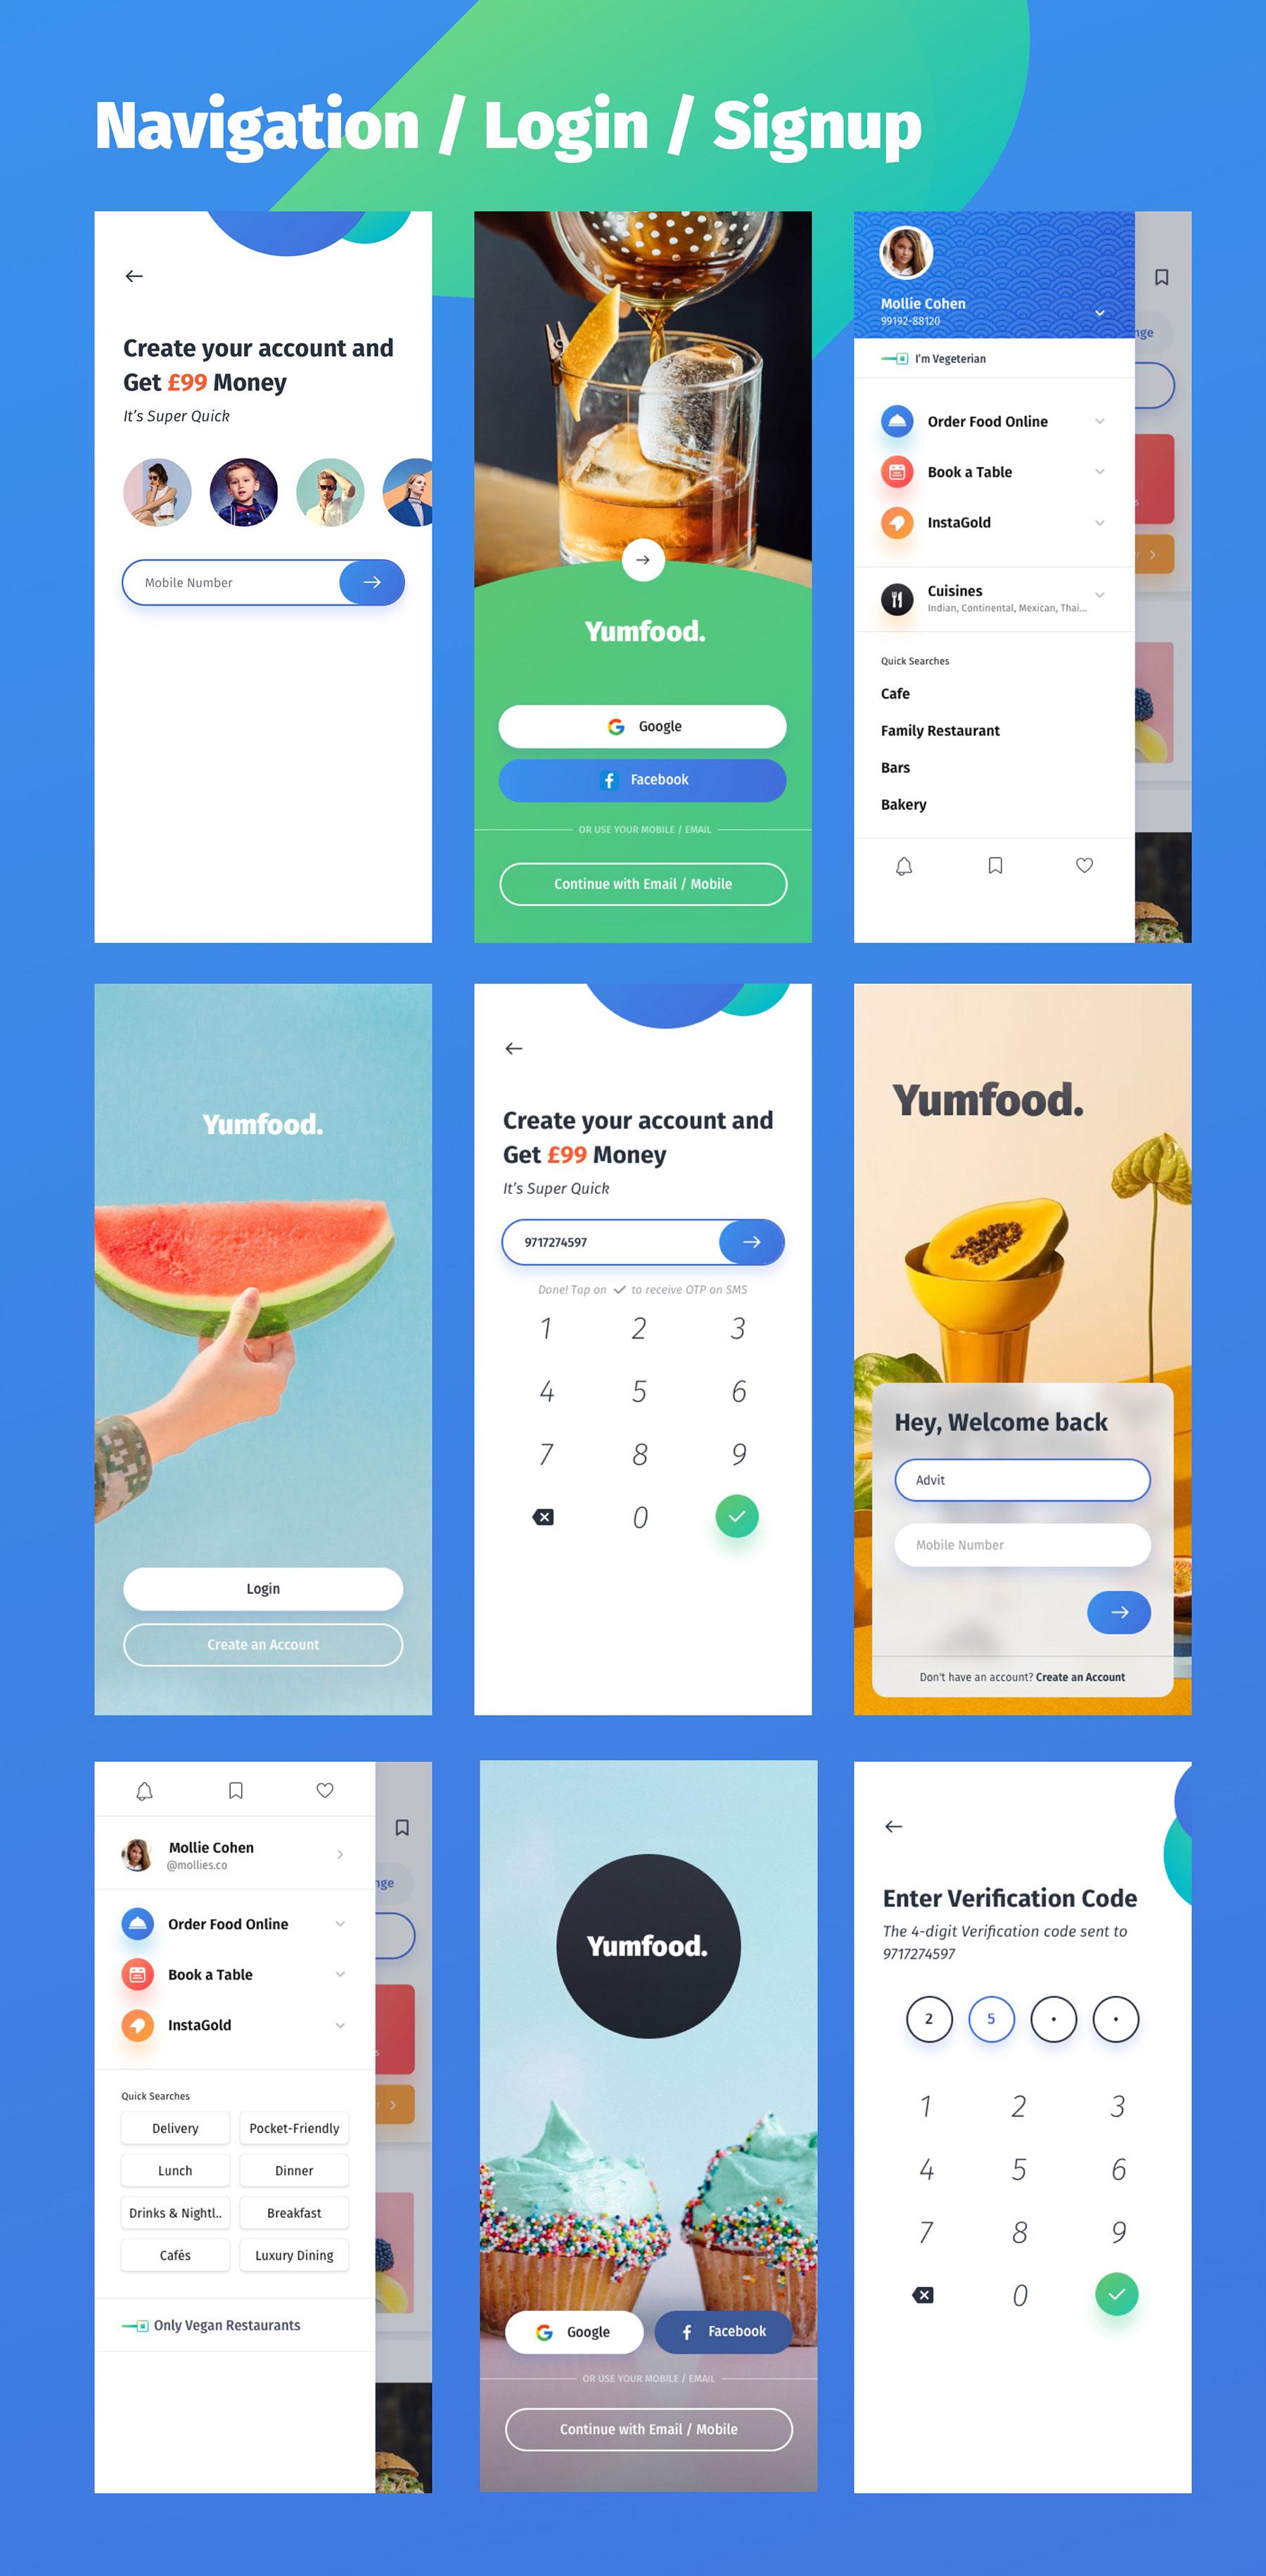 咖啡店酒店餐馆食品外卖APP应用程序UI界面设计套件 YumFood – Mobile App UI kit插图(10)